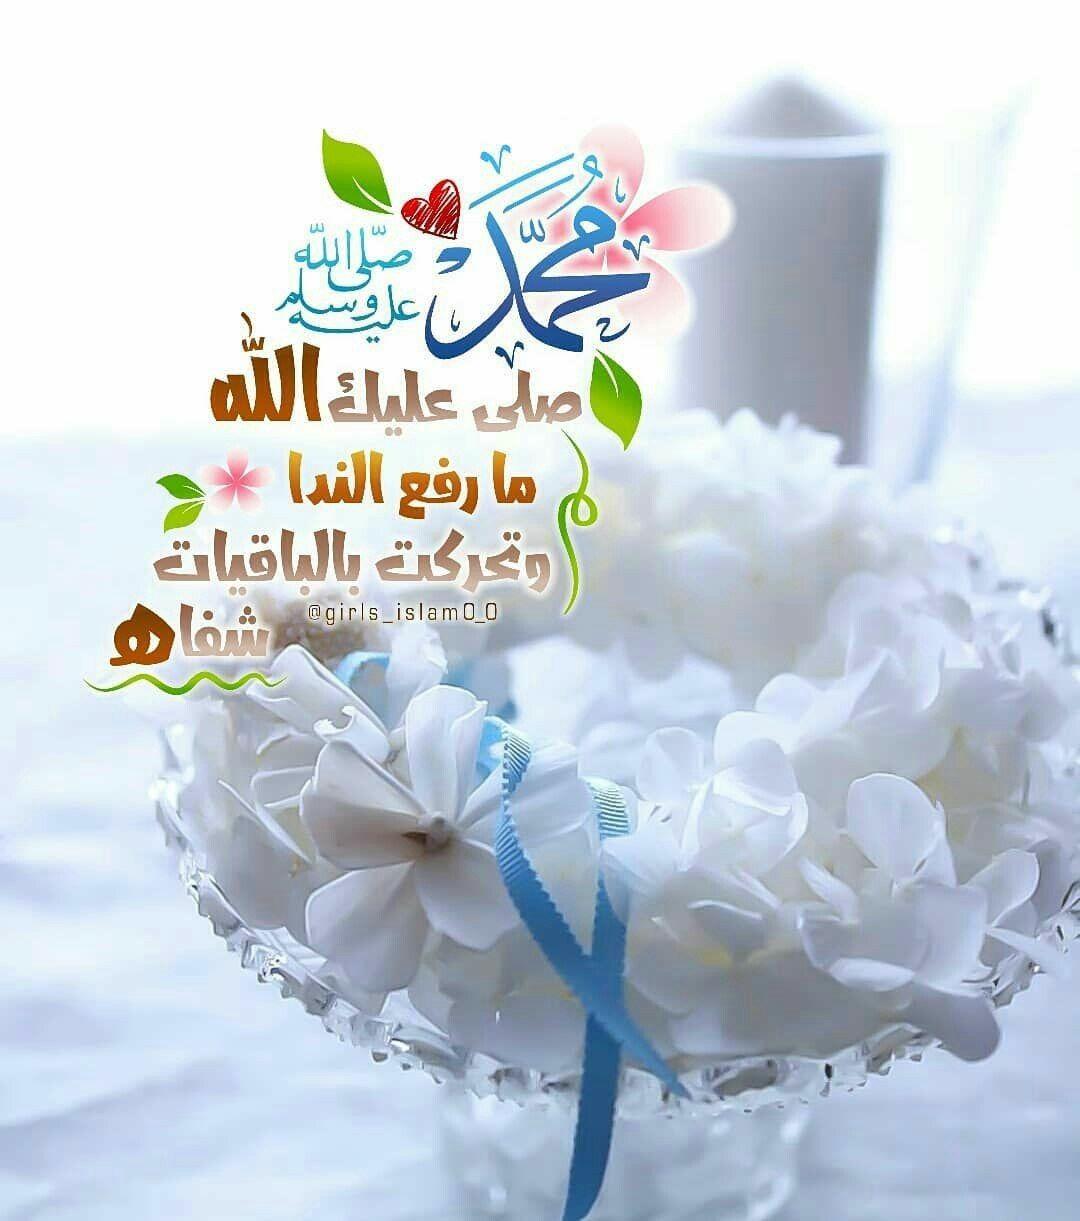 Pin By Ayat Murad On أجيب دعوة الداعي Romantic Love Quotes Islamic Pictures Greetings